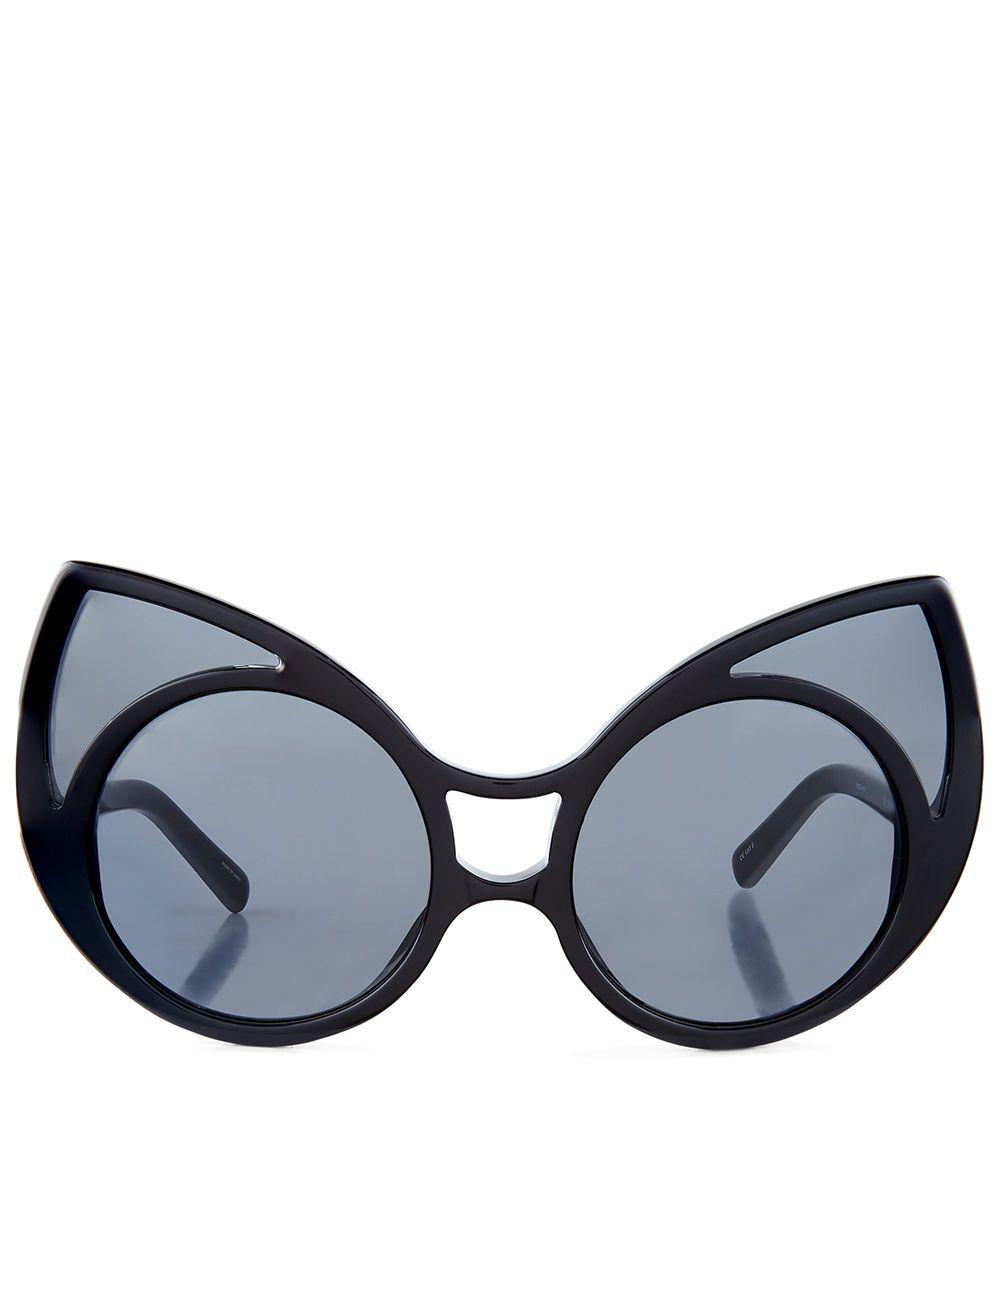 3aa50812f099 LINDA FARROW Black Pointed Cat Eye Sunglasses.  lindafarrow  sunglasses